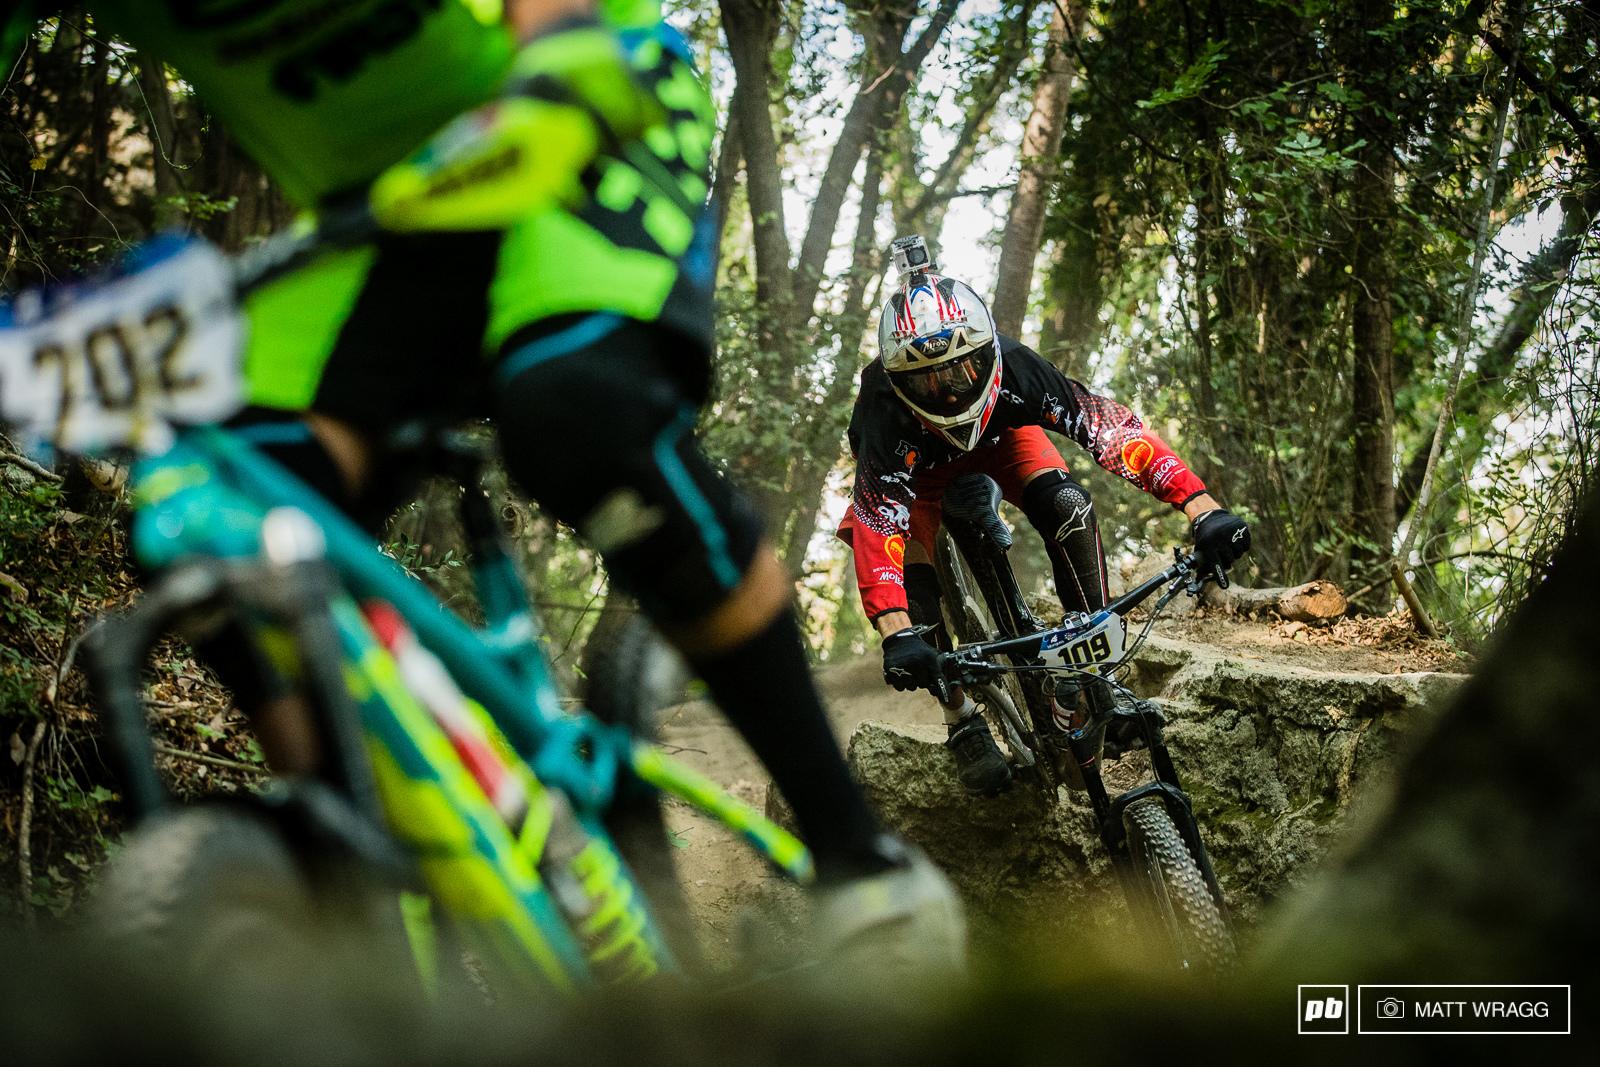 One of Italy s top riders Vittorio Gambirasio on the hunt in practice.